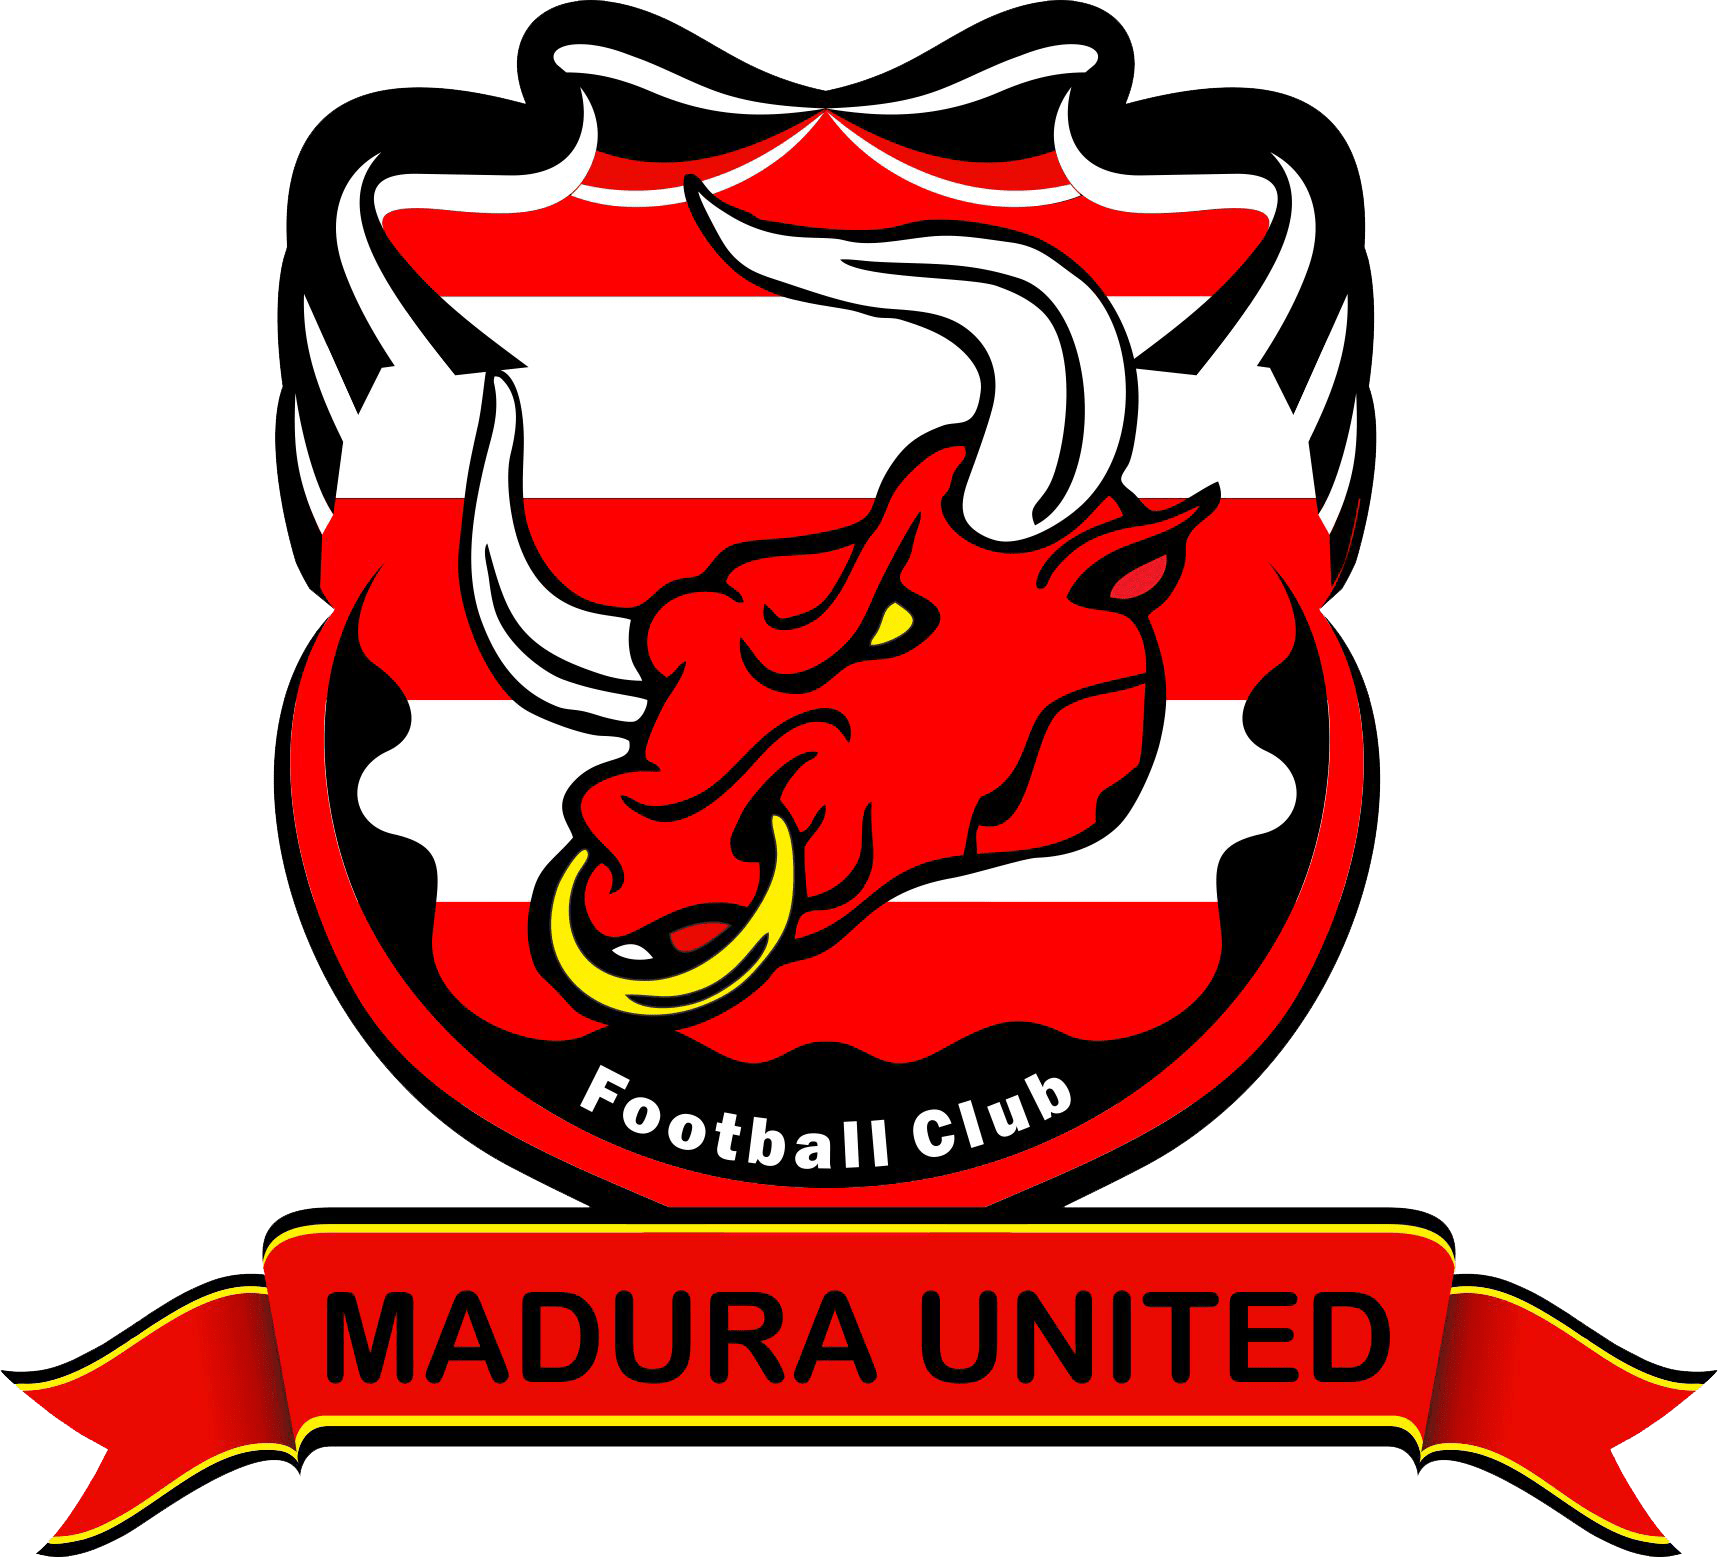 Logo Madura United 2019 2020